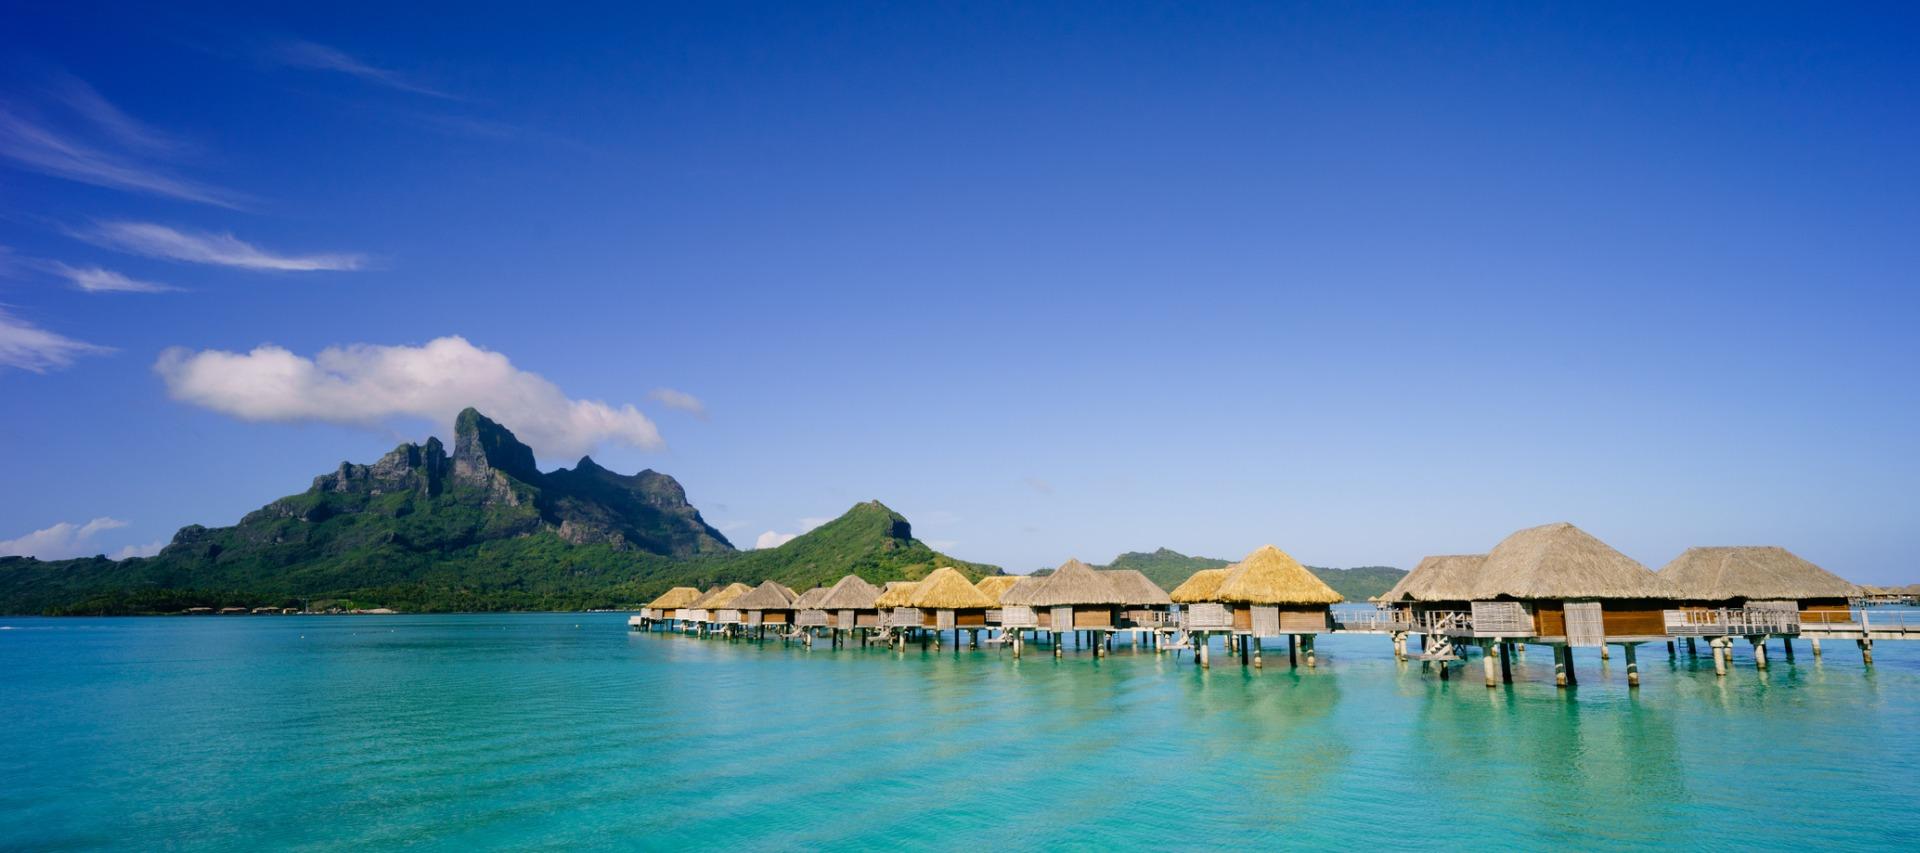 Trois semaines en Polynésie